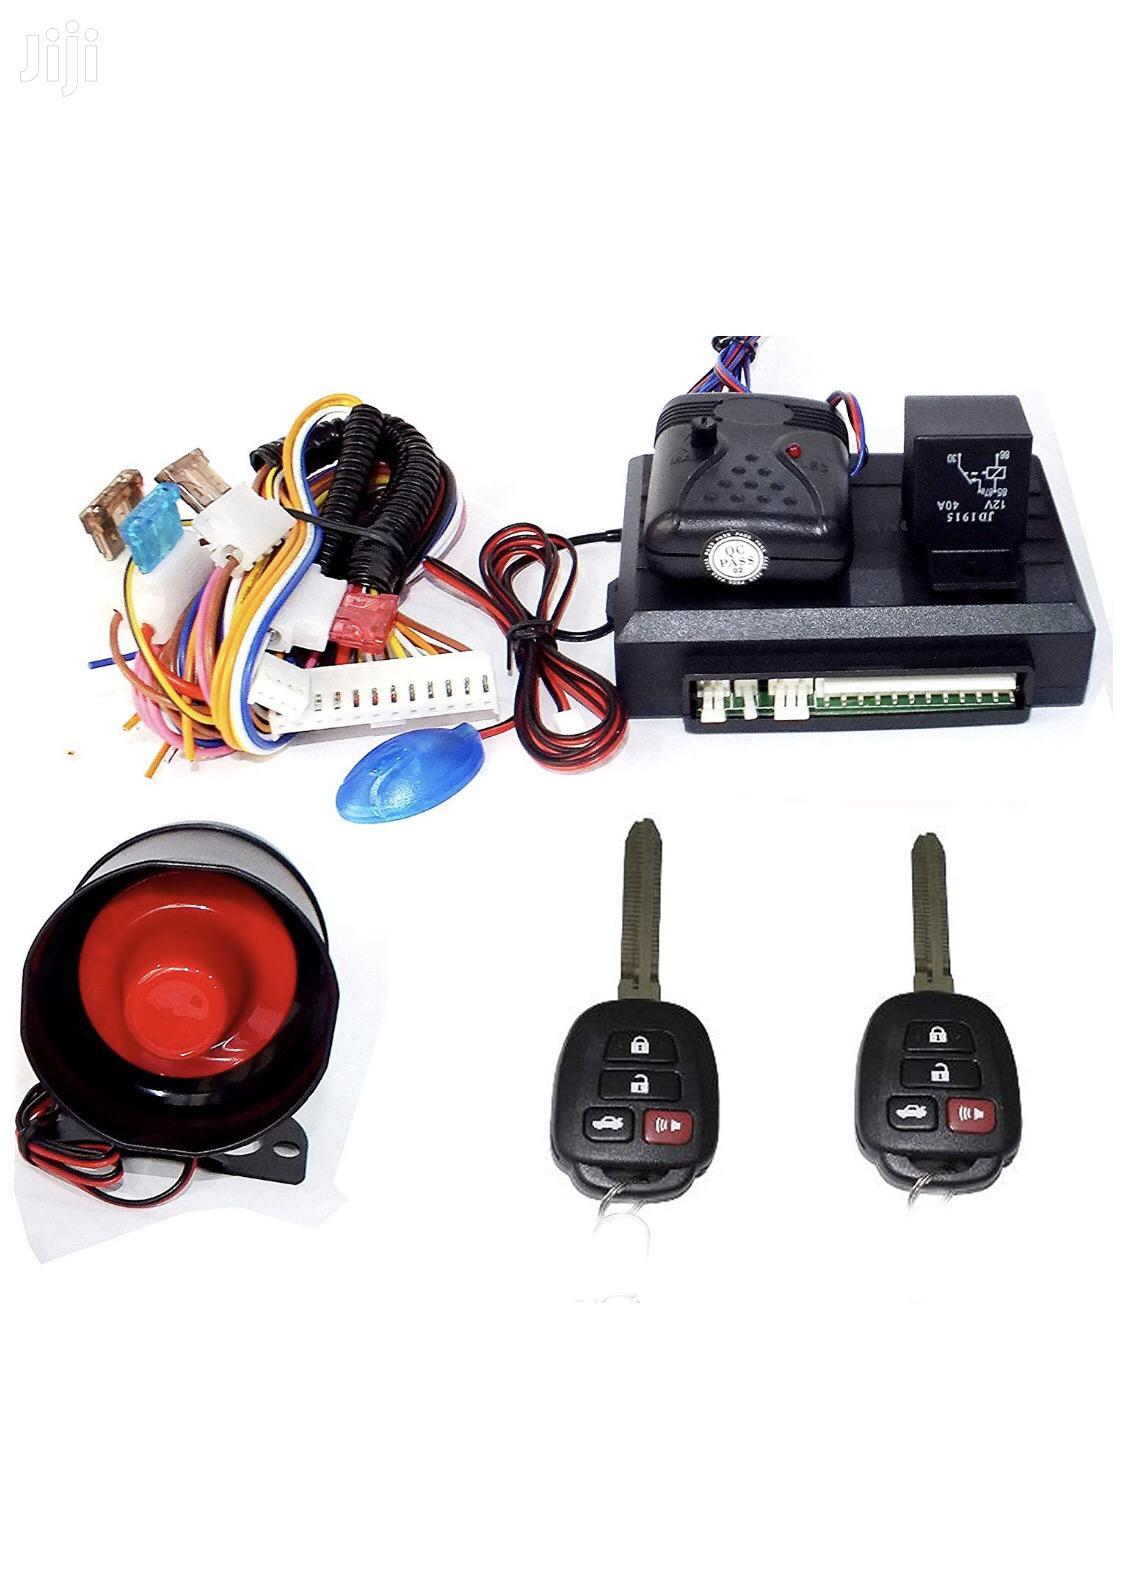 Universal Car Alarm Systems Remote Control 2 KEYS KEYLESS ENTRY SYSTEM